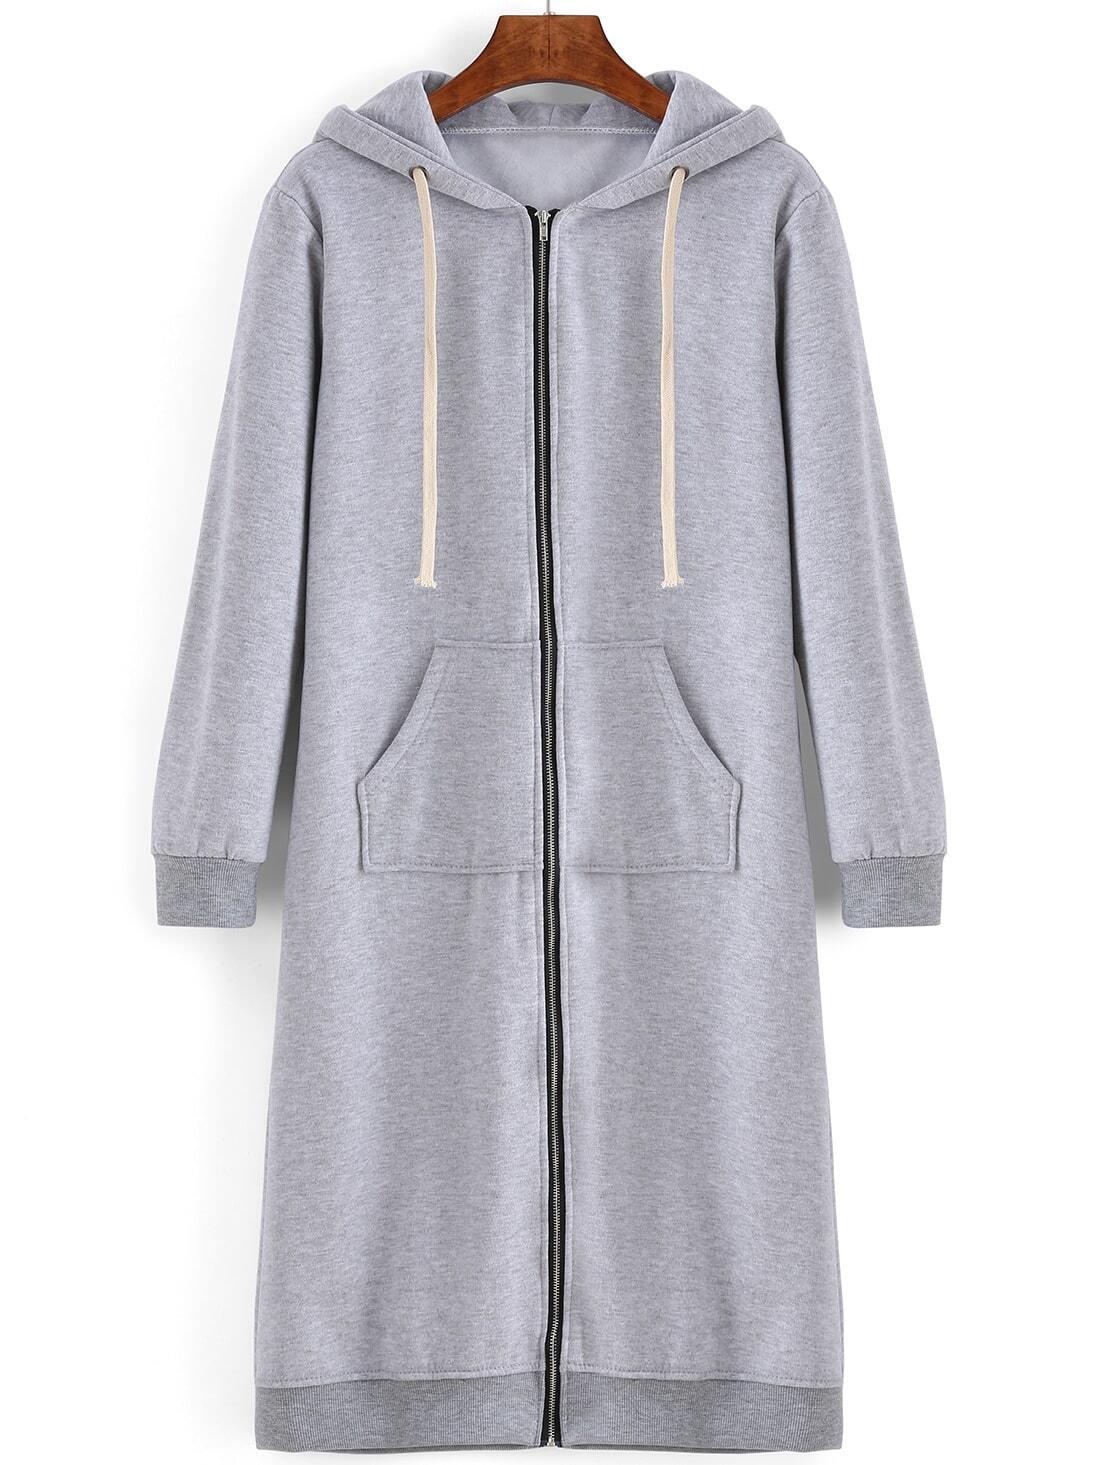 sweat shirt robe avec capuche et poches zipp e gris french romwe. Black Bedroom Furniture Sets. Home Design Ideas